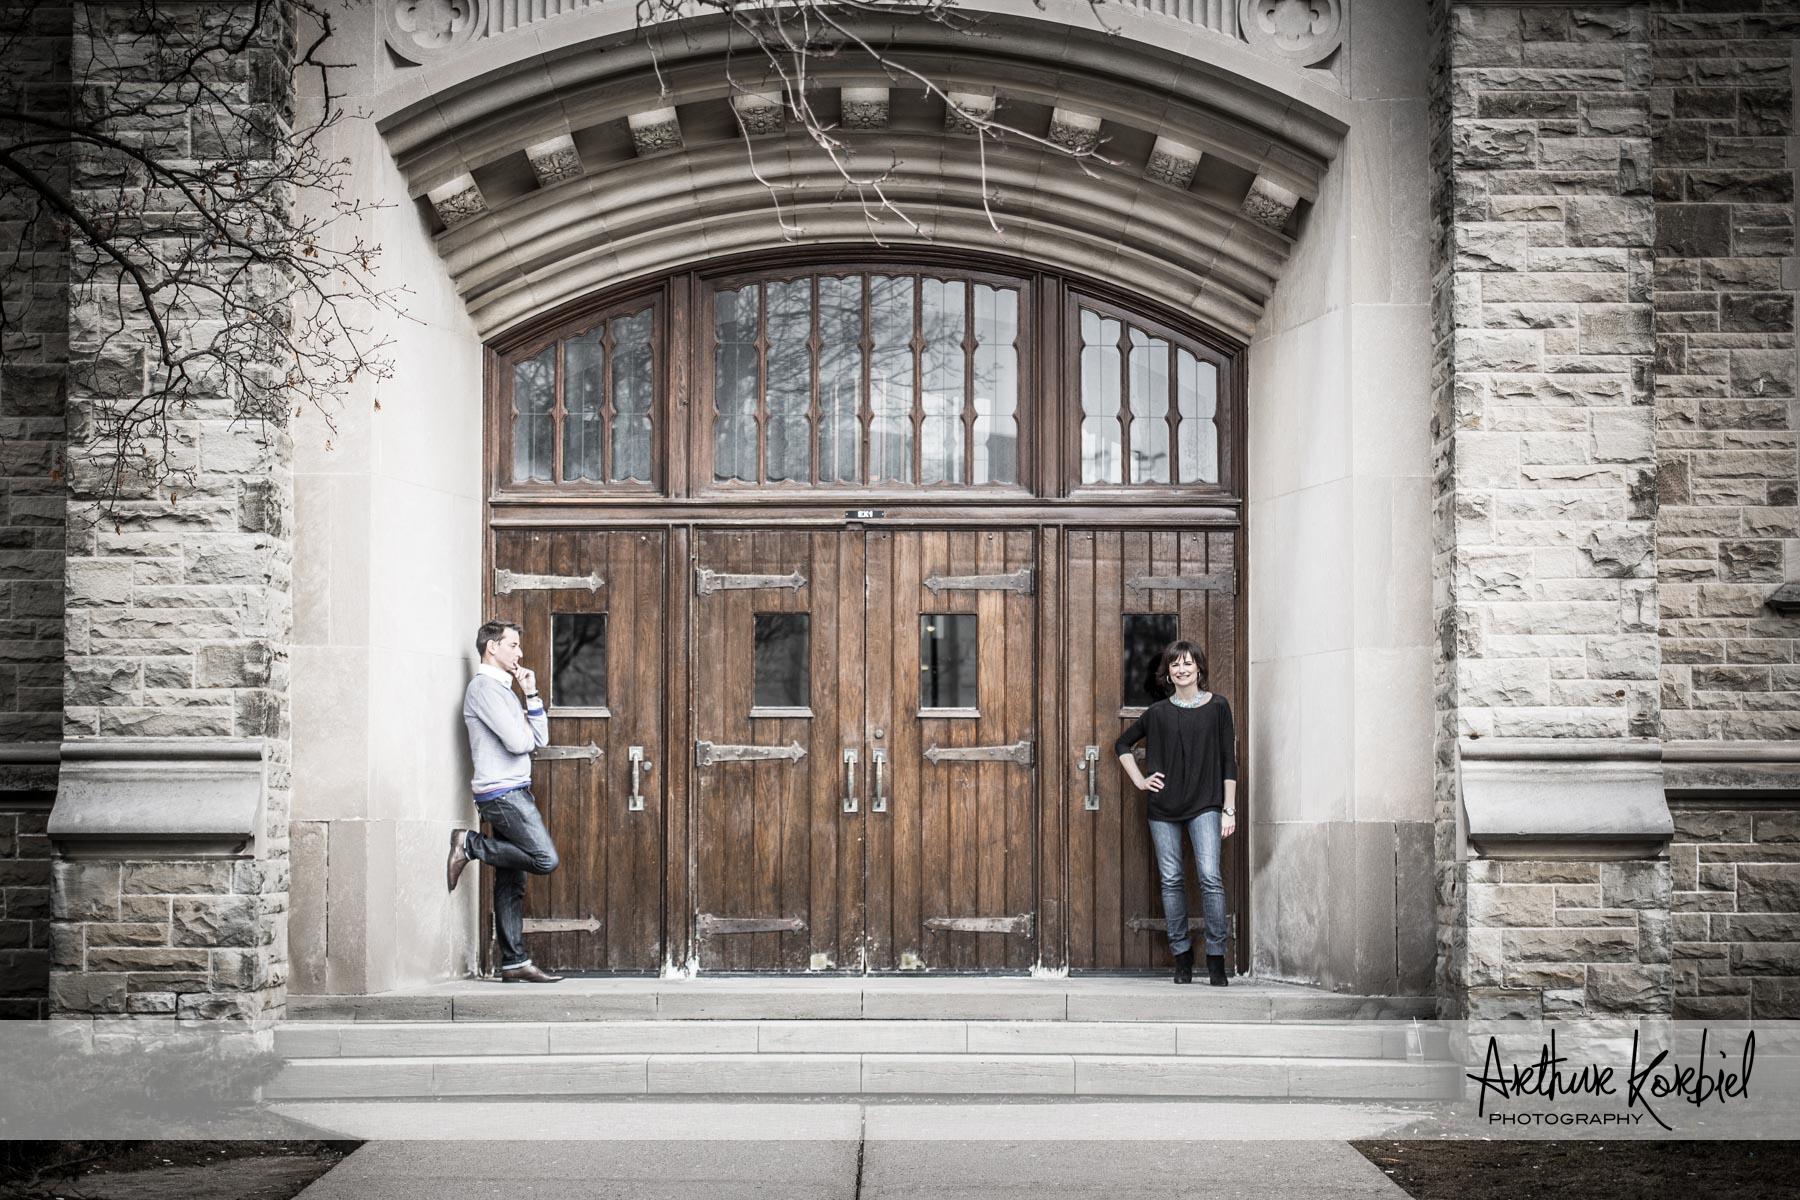 Arthur Korbiel Photography - London Engagement Photographer-008.jpg